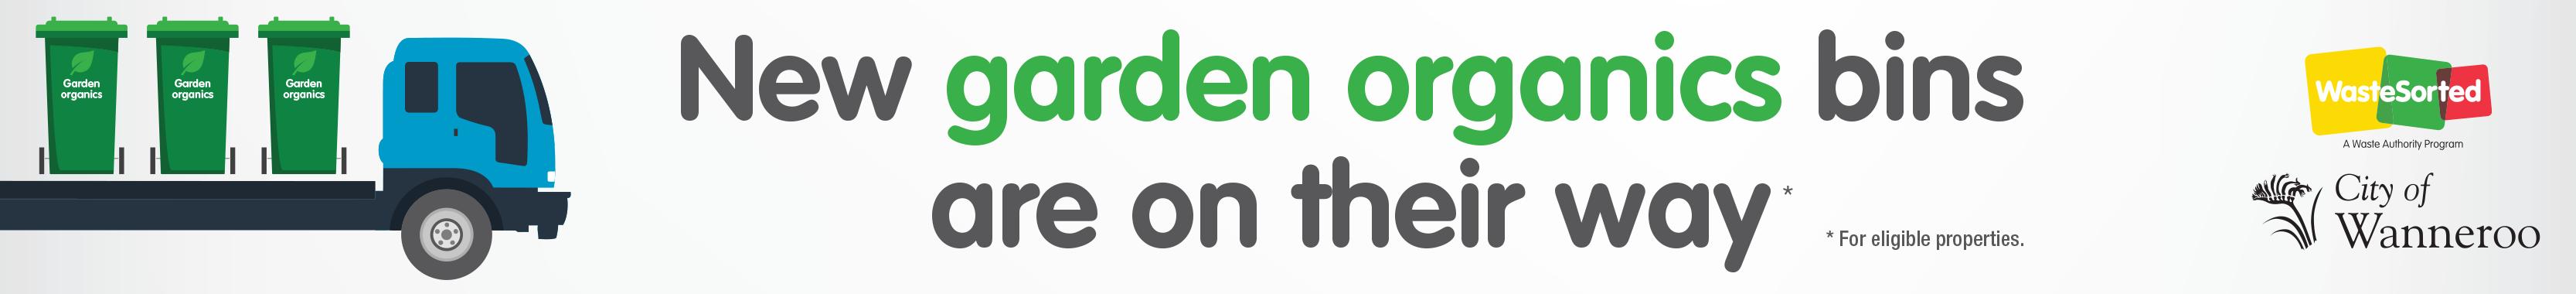 Banner for garden organics bins